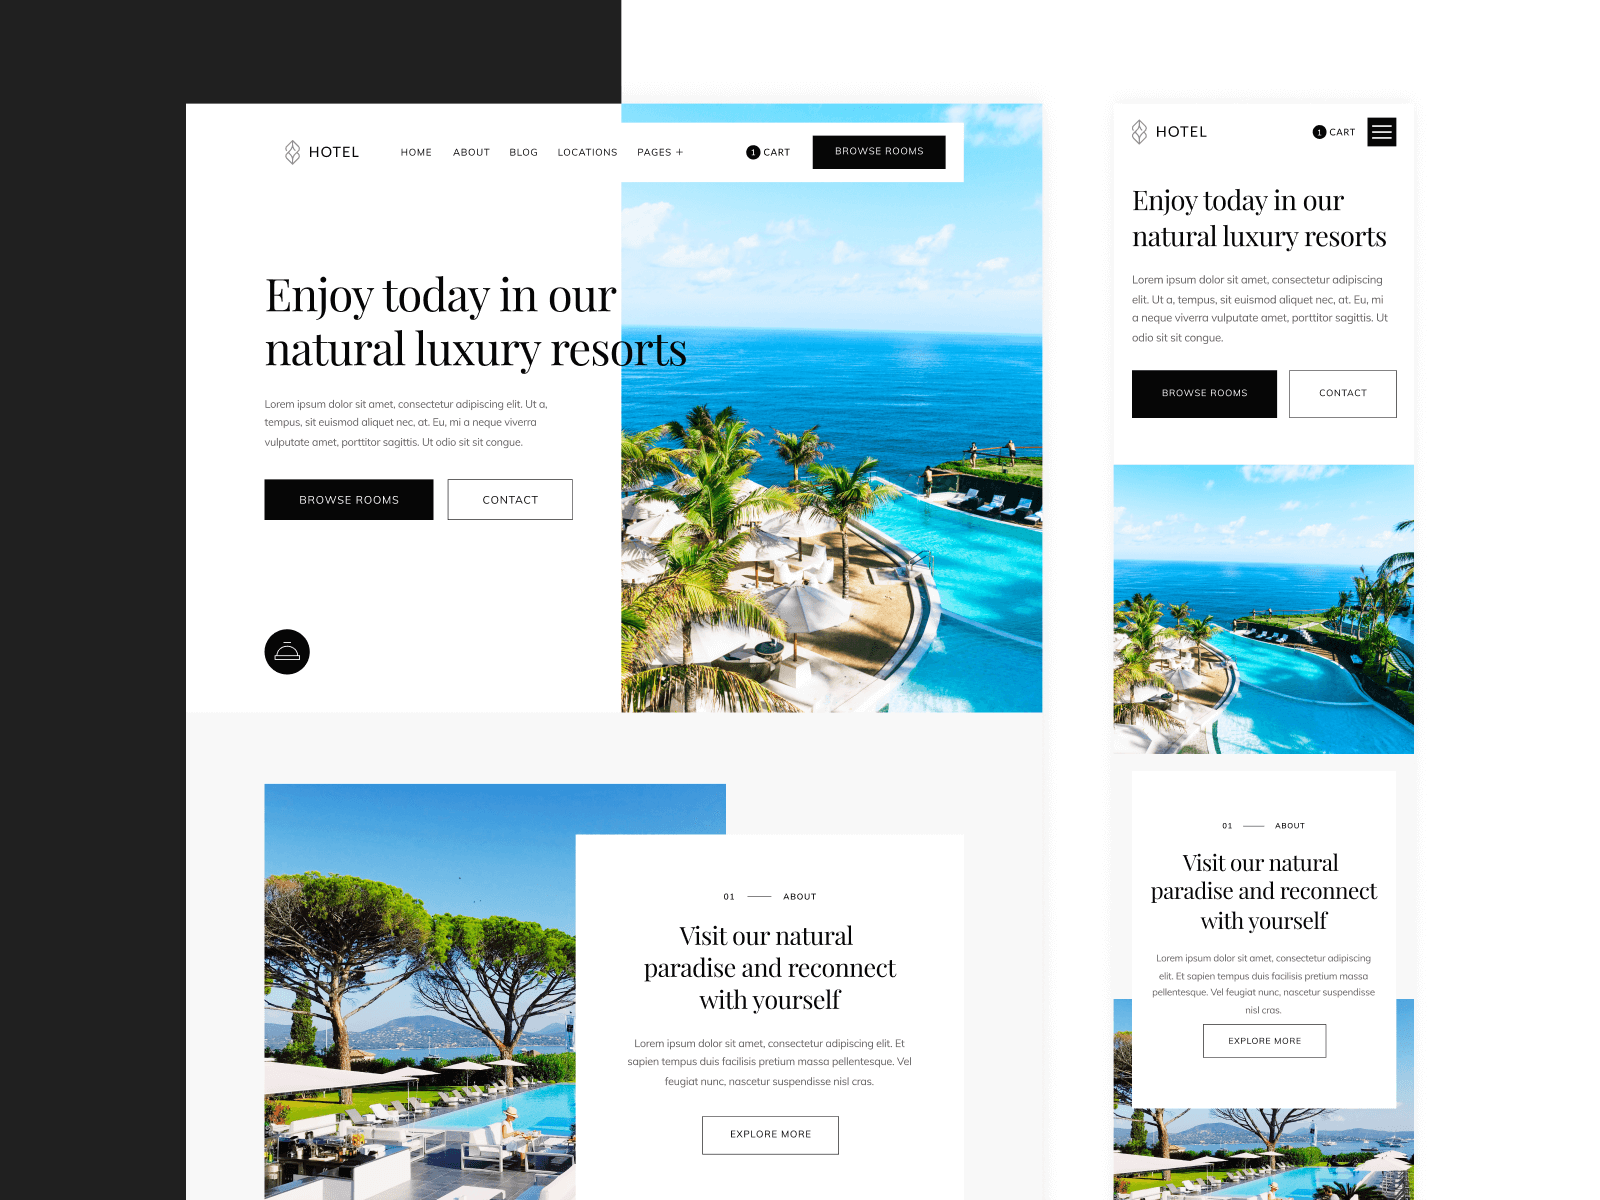 Hotel Resort Center Webflow Template